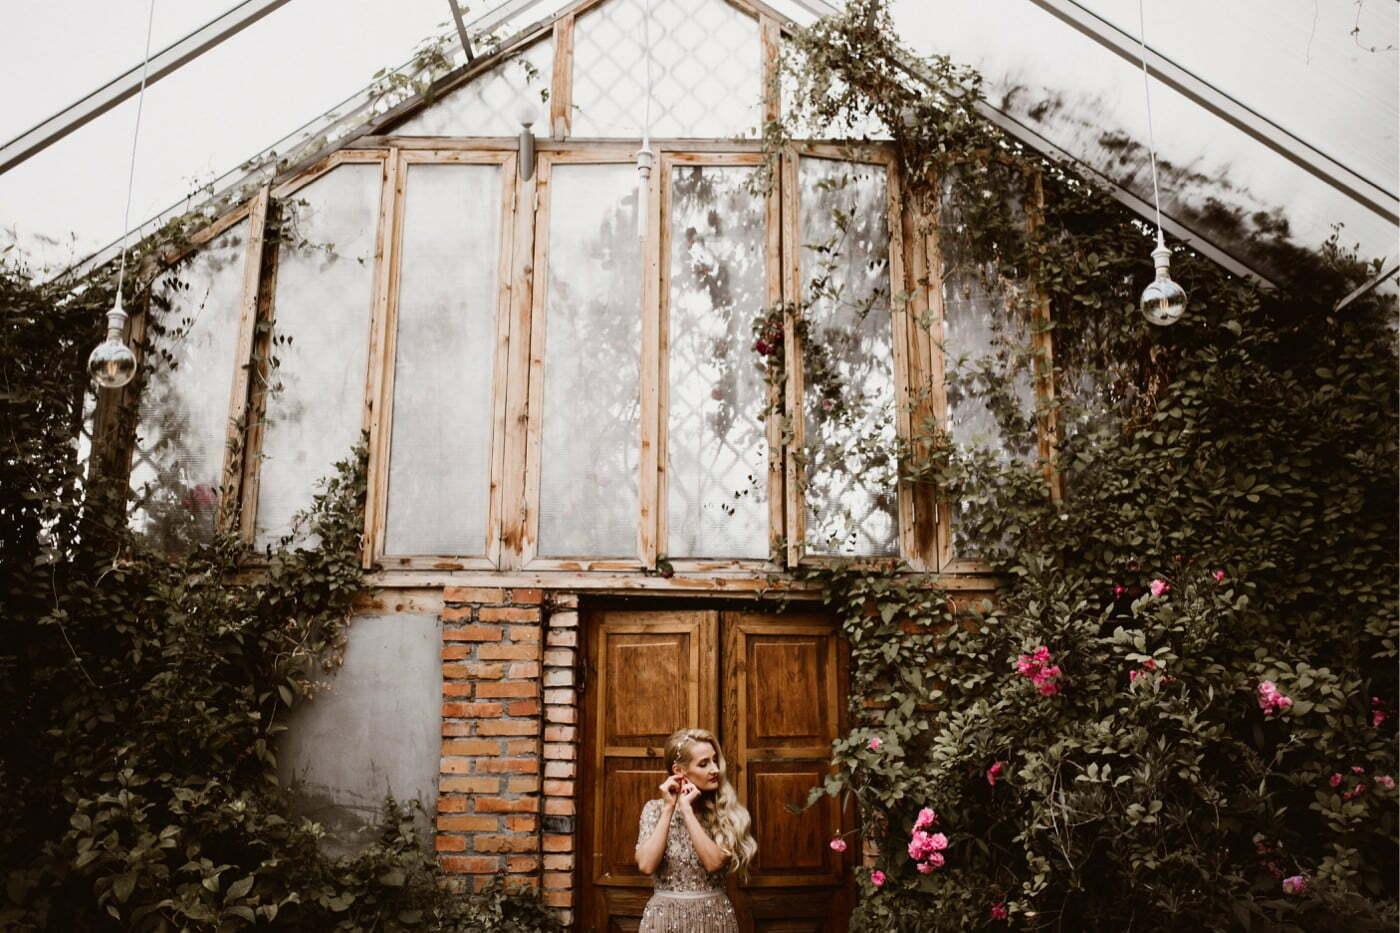 ewelina zieba rustykalne wesele stara oranzeria warszawa 018